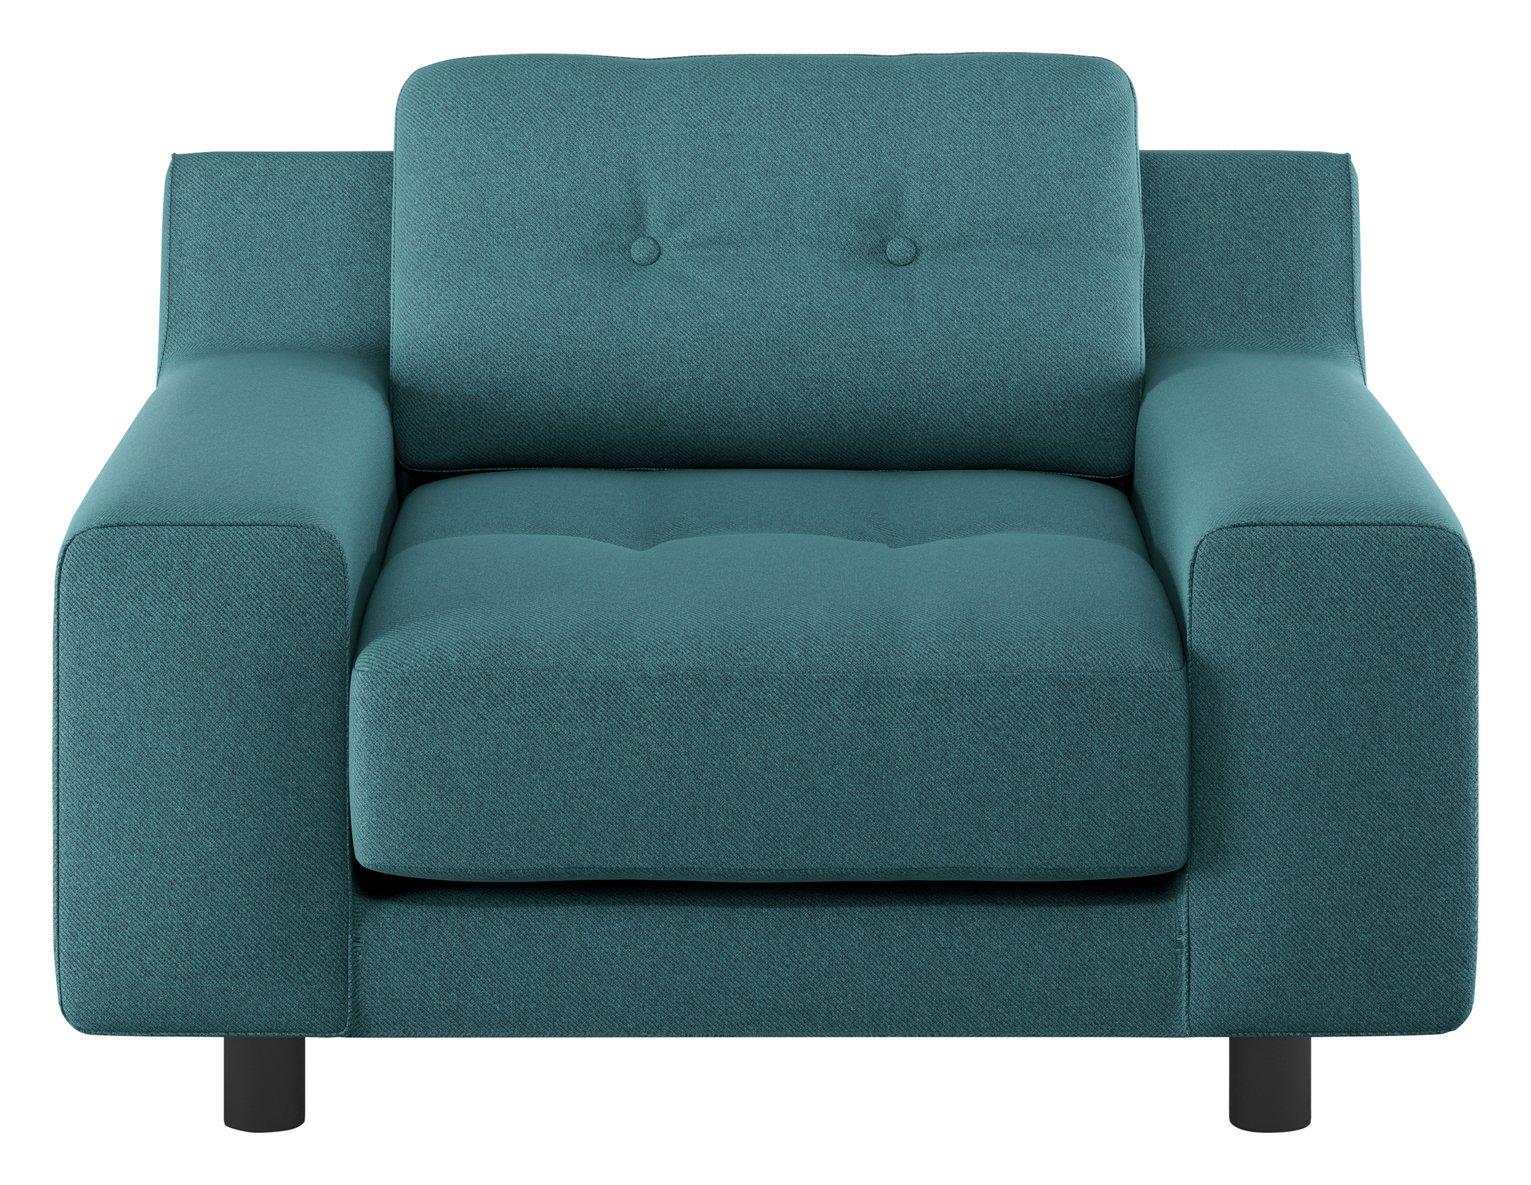 Habitat Hendricks Teal Fabric Armchair